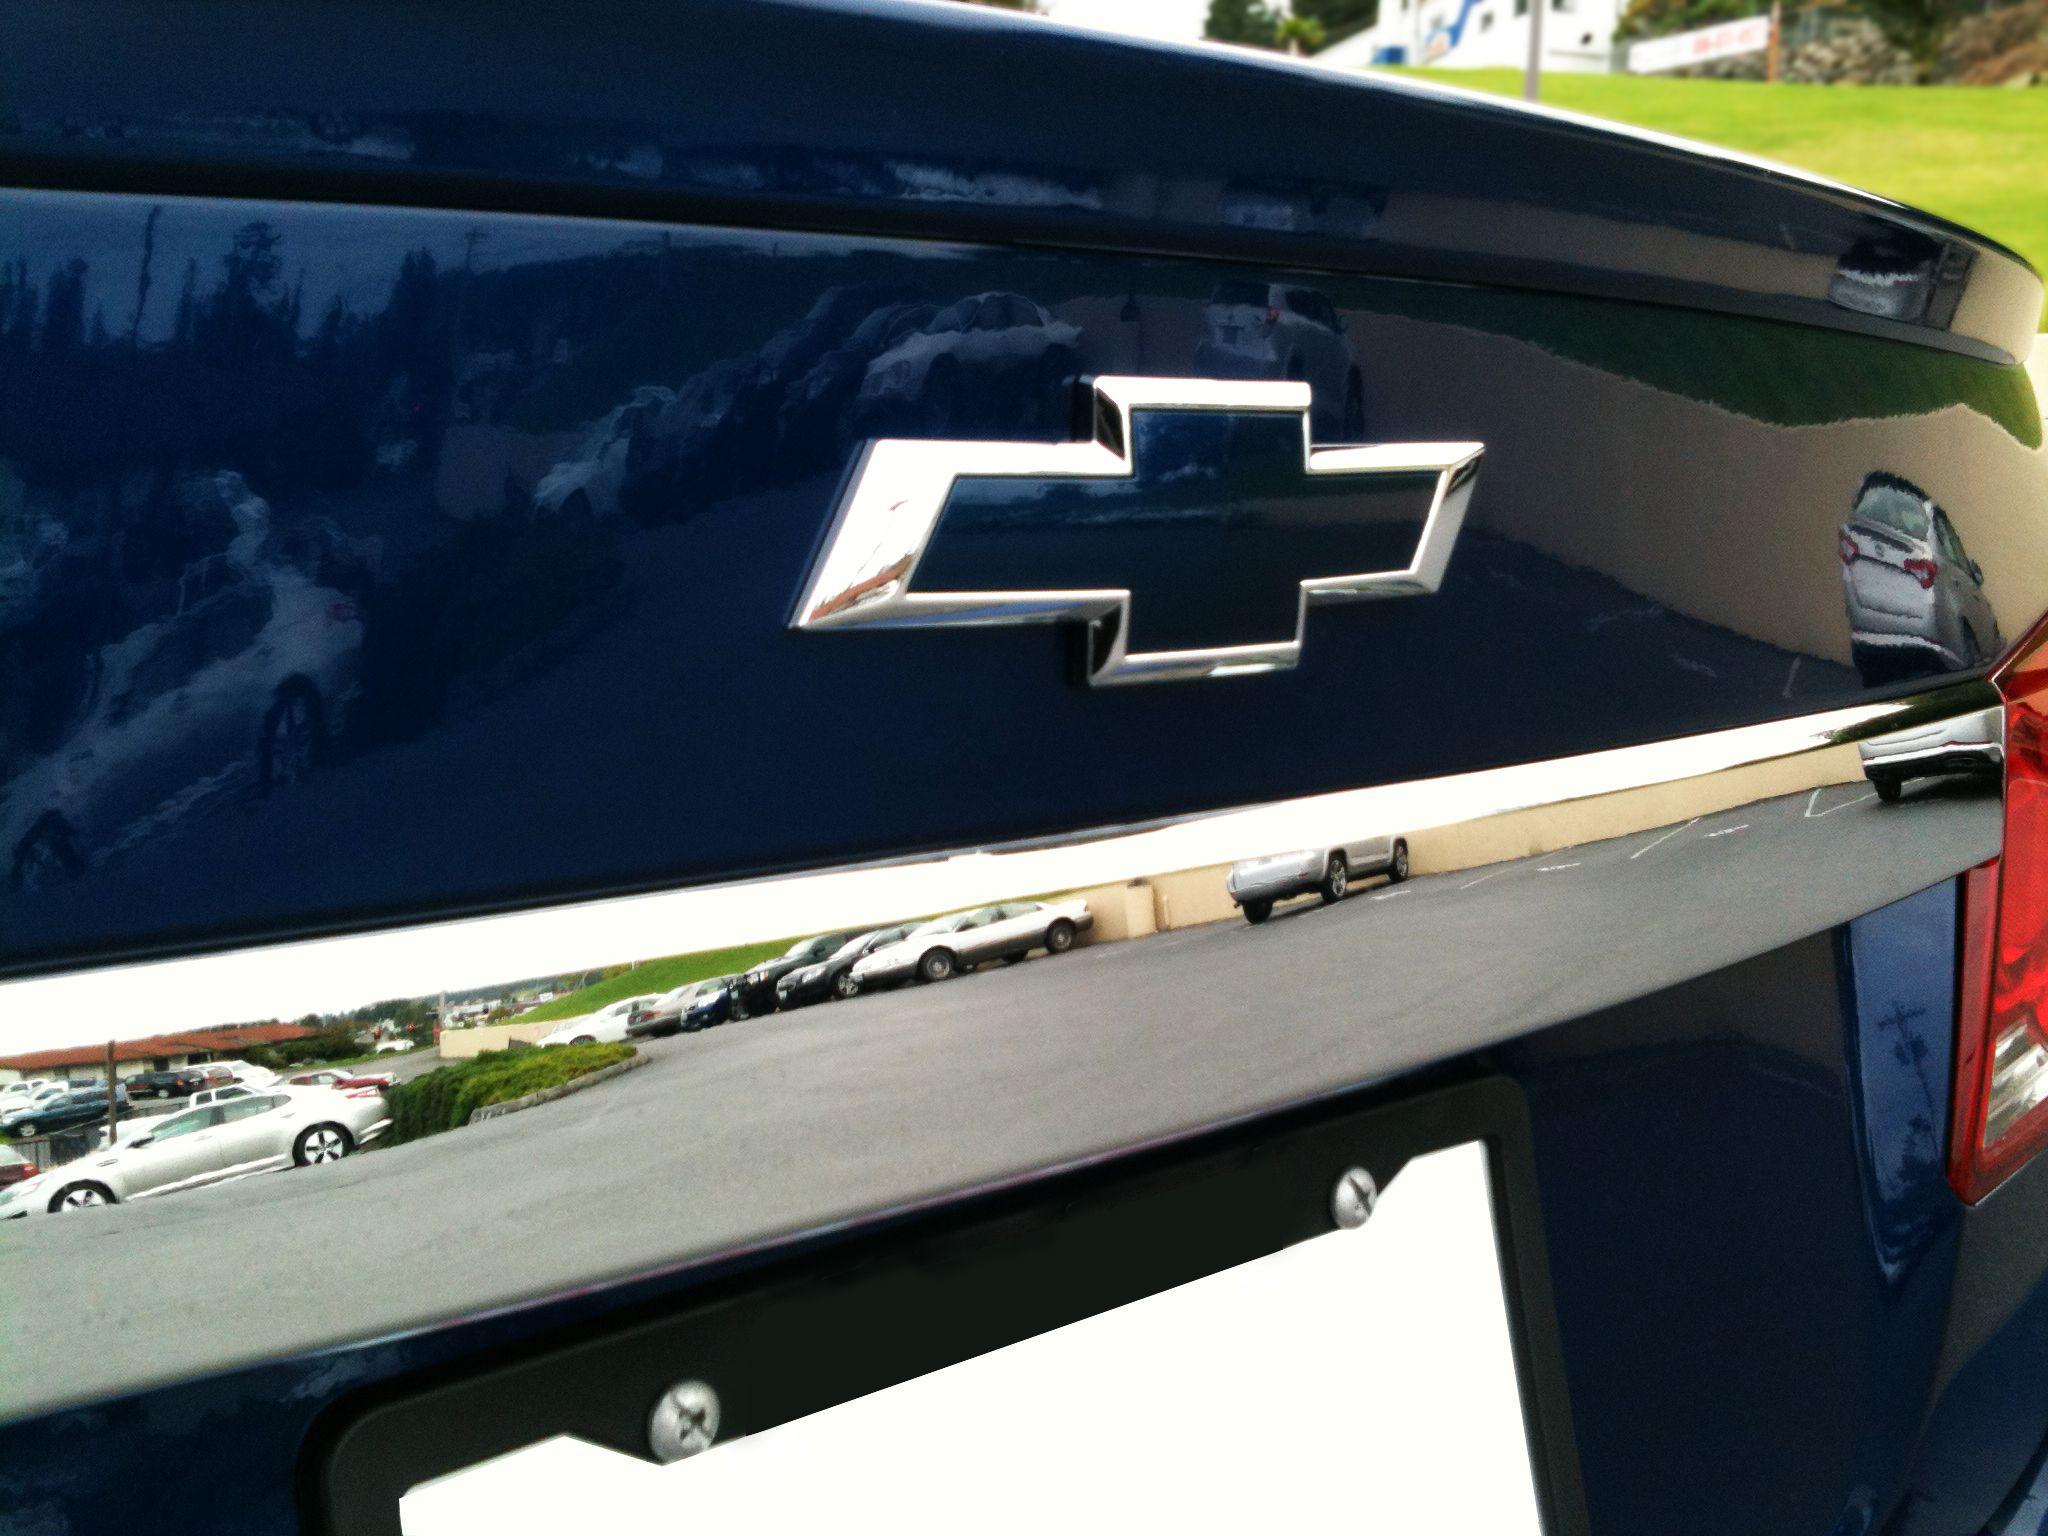 Chevy Logo Chevrolet trucks, Silverado truck, 2014 tahoe